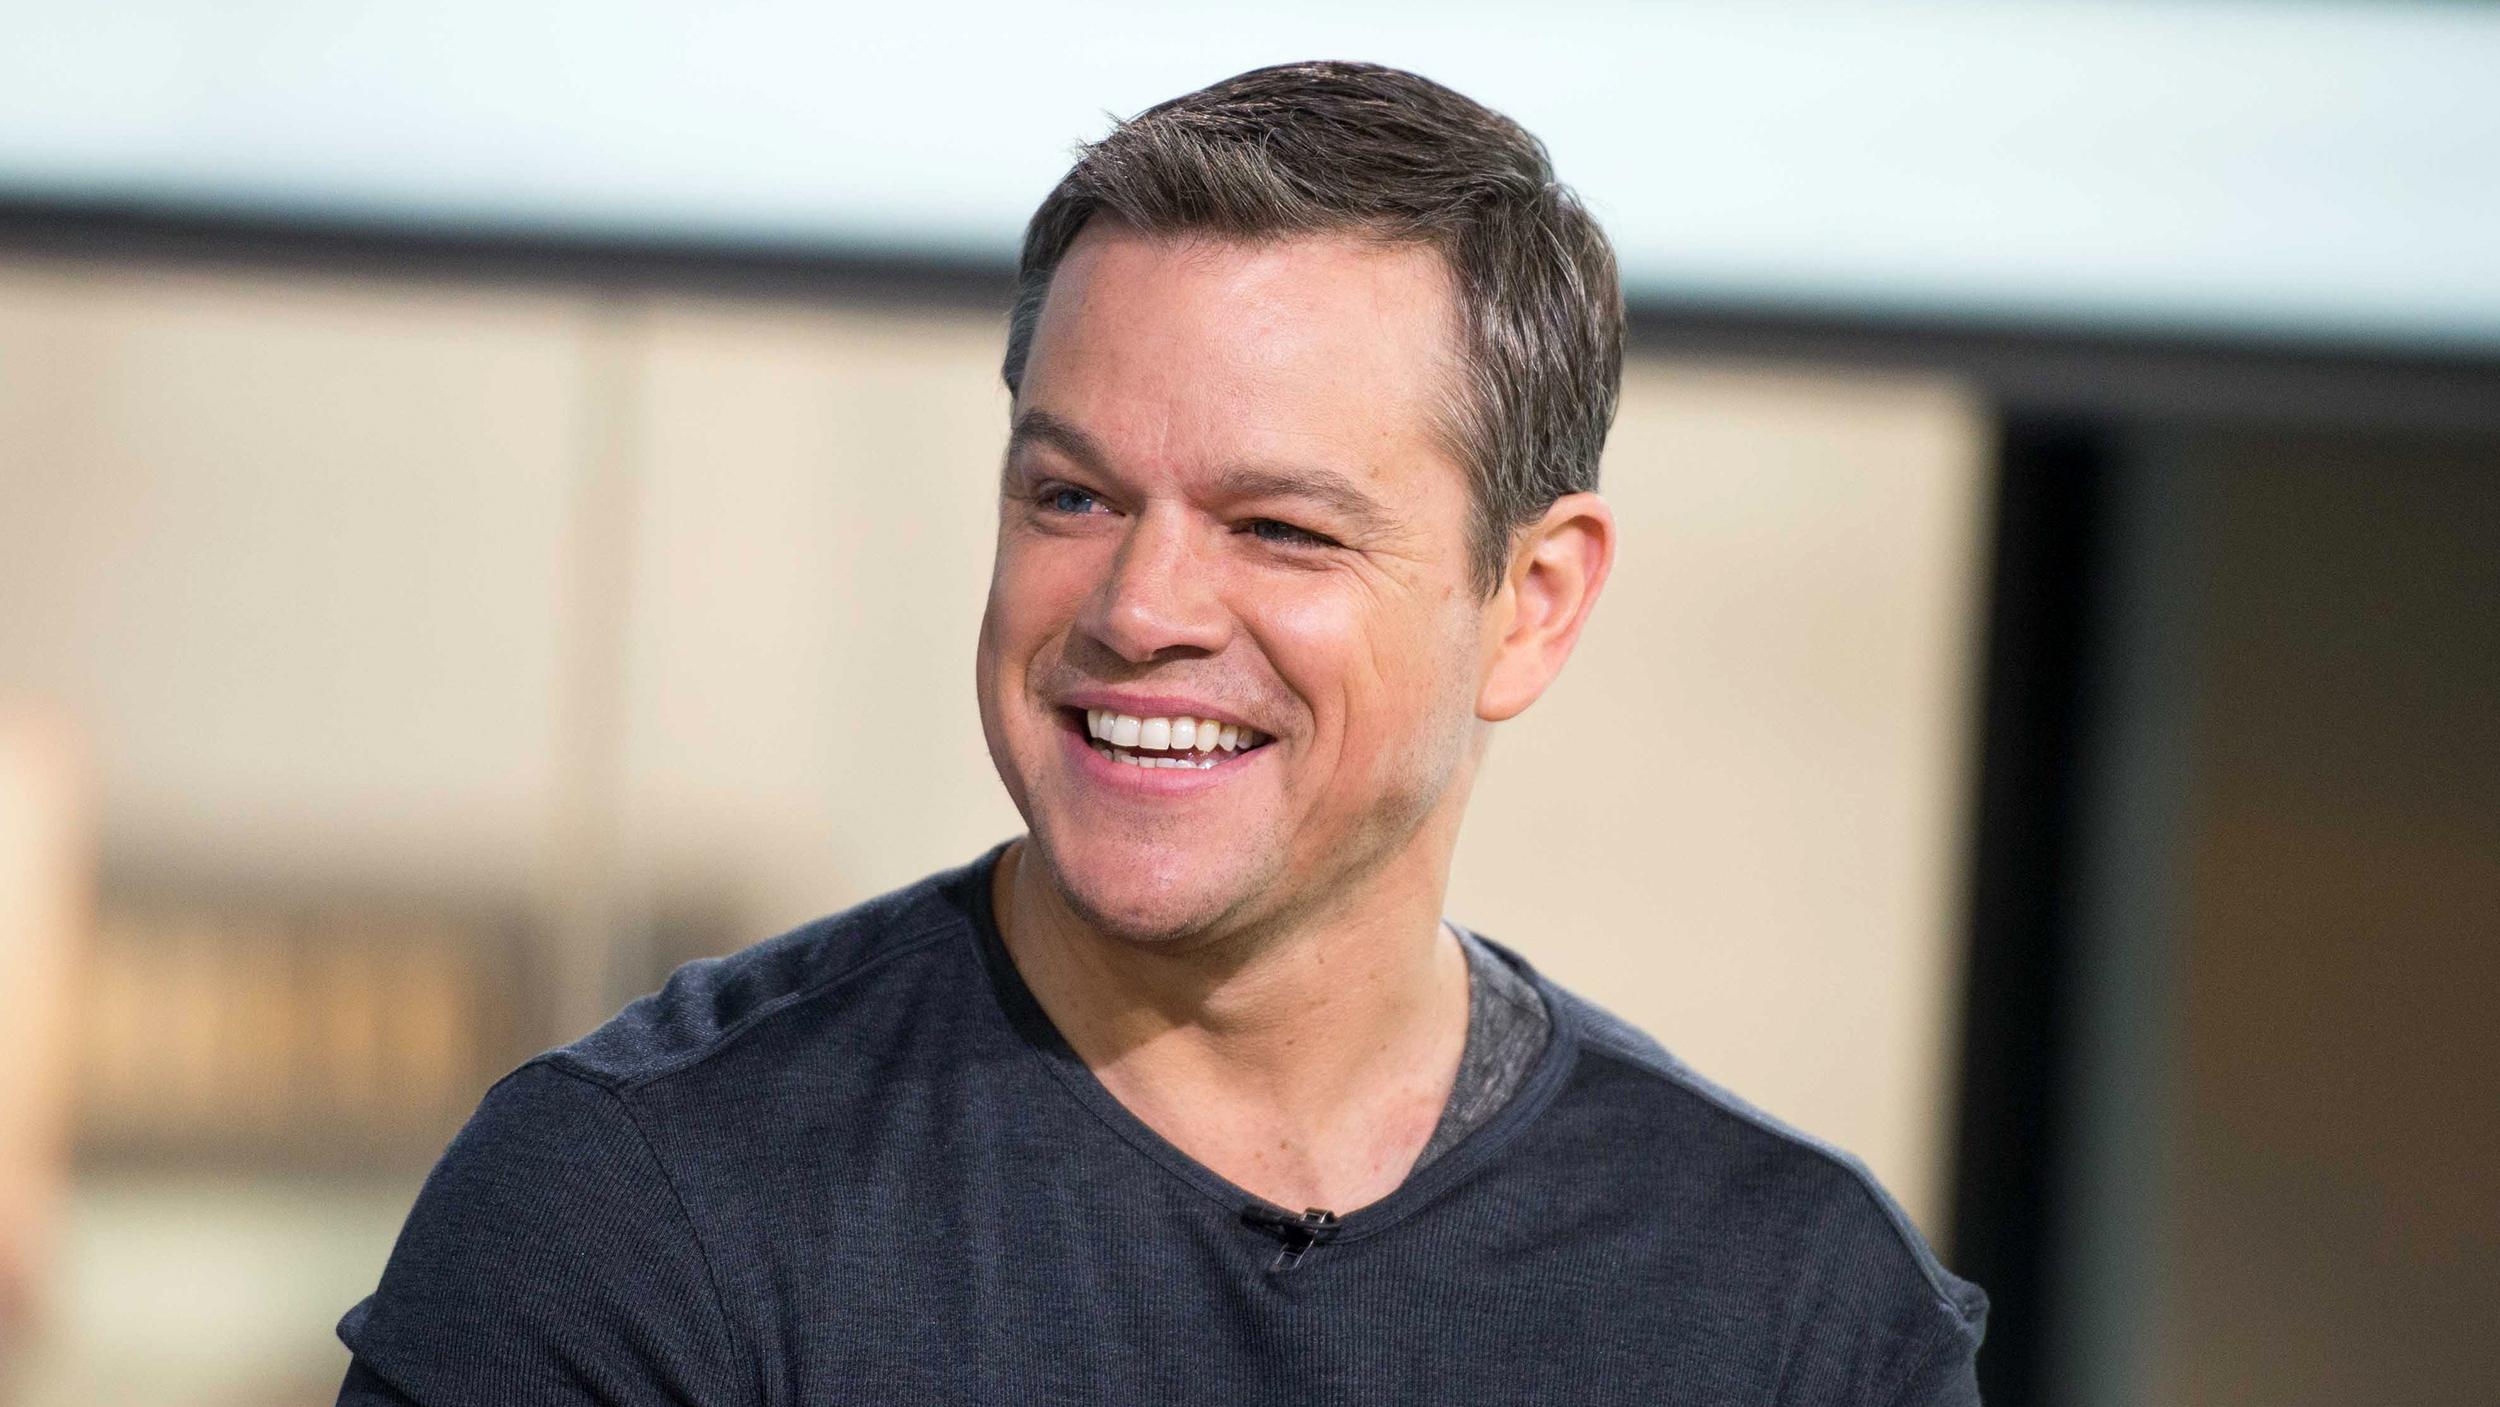 Matt Damon Reveals The Toughest Part About Reprising